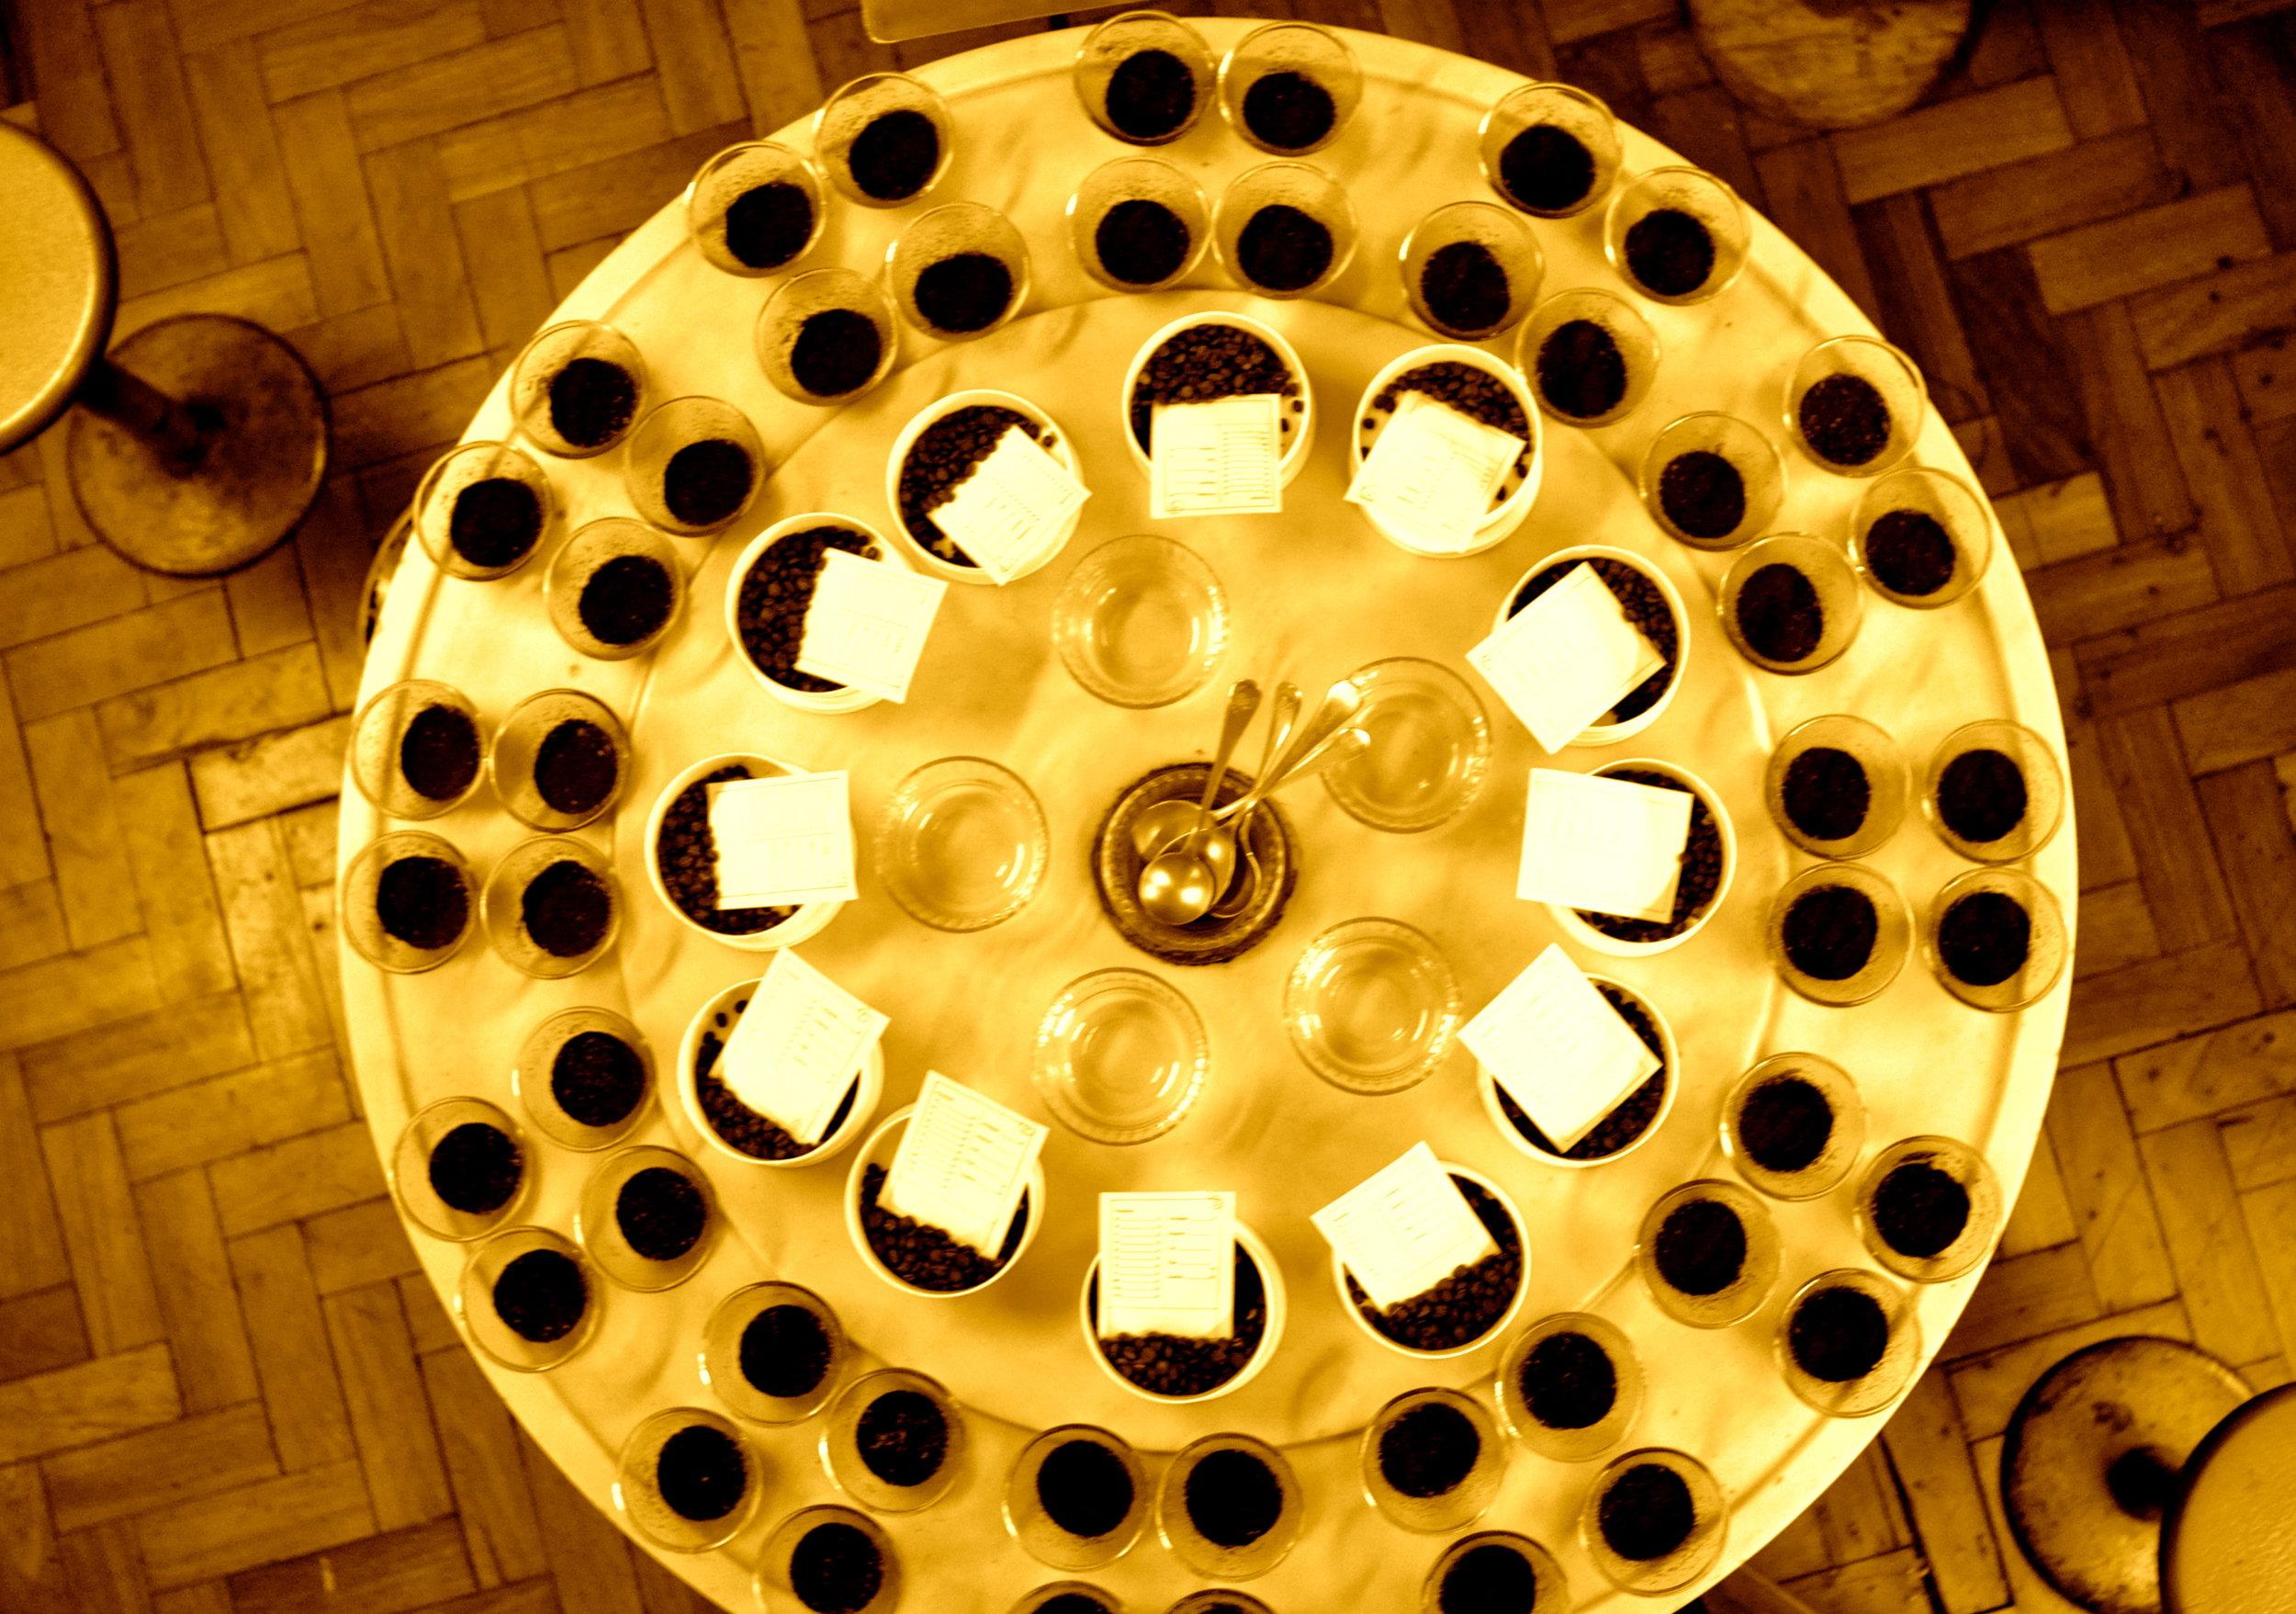 cupping_wheel.jpeg